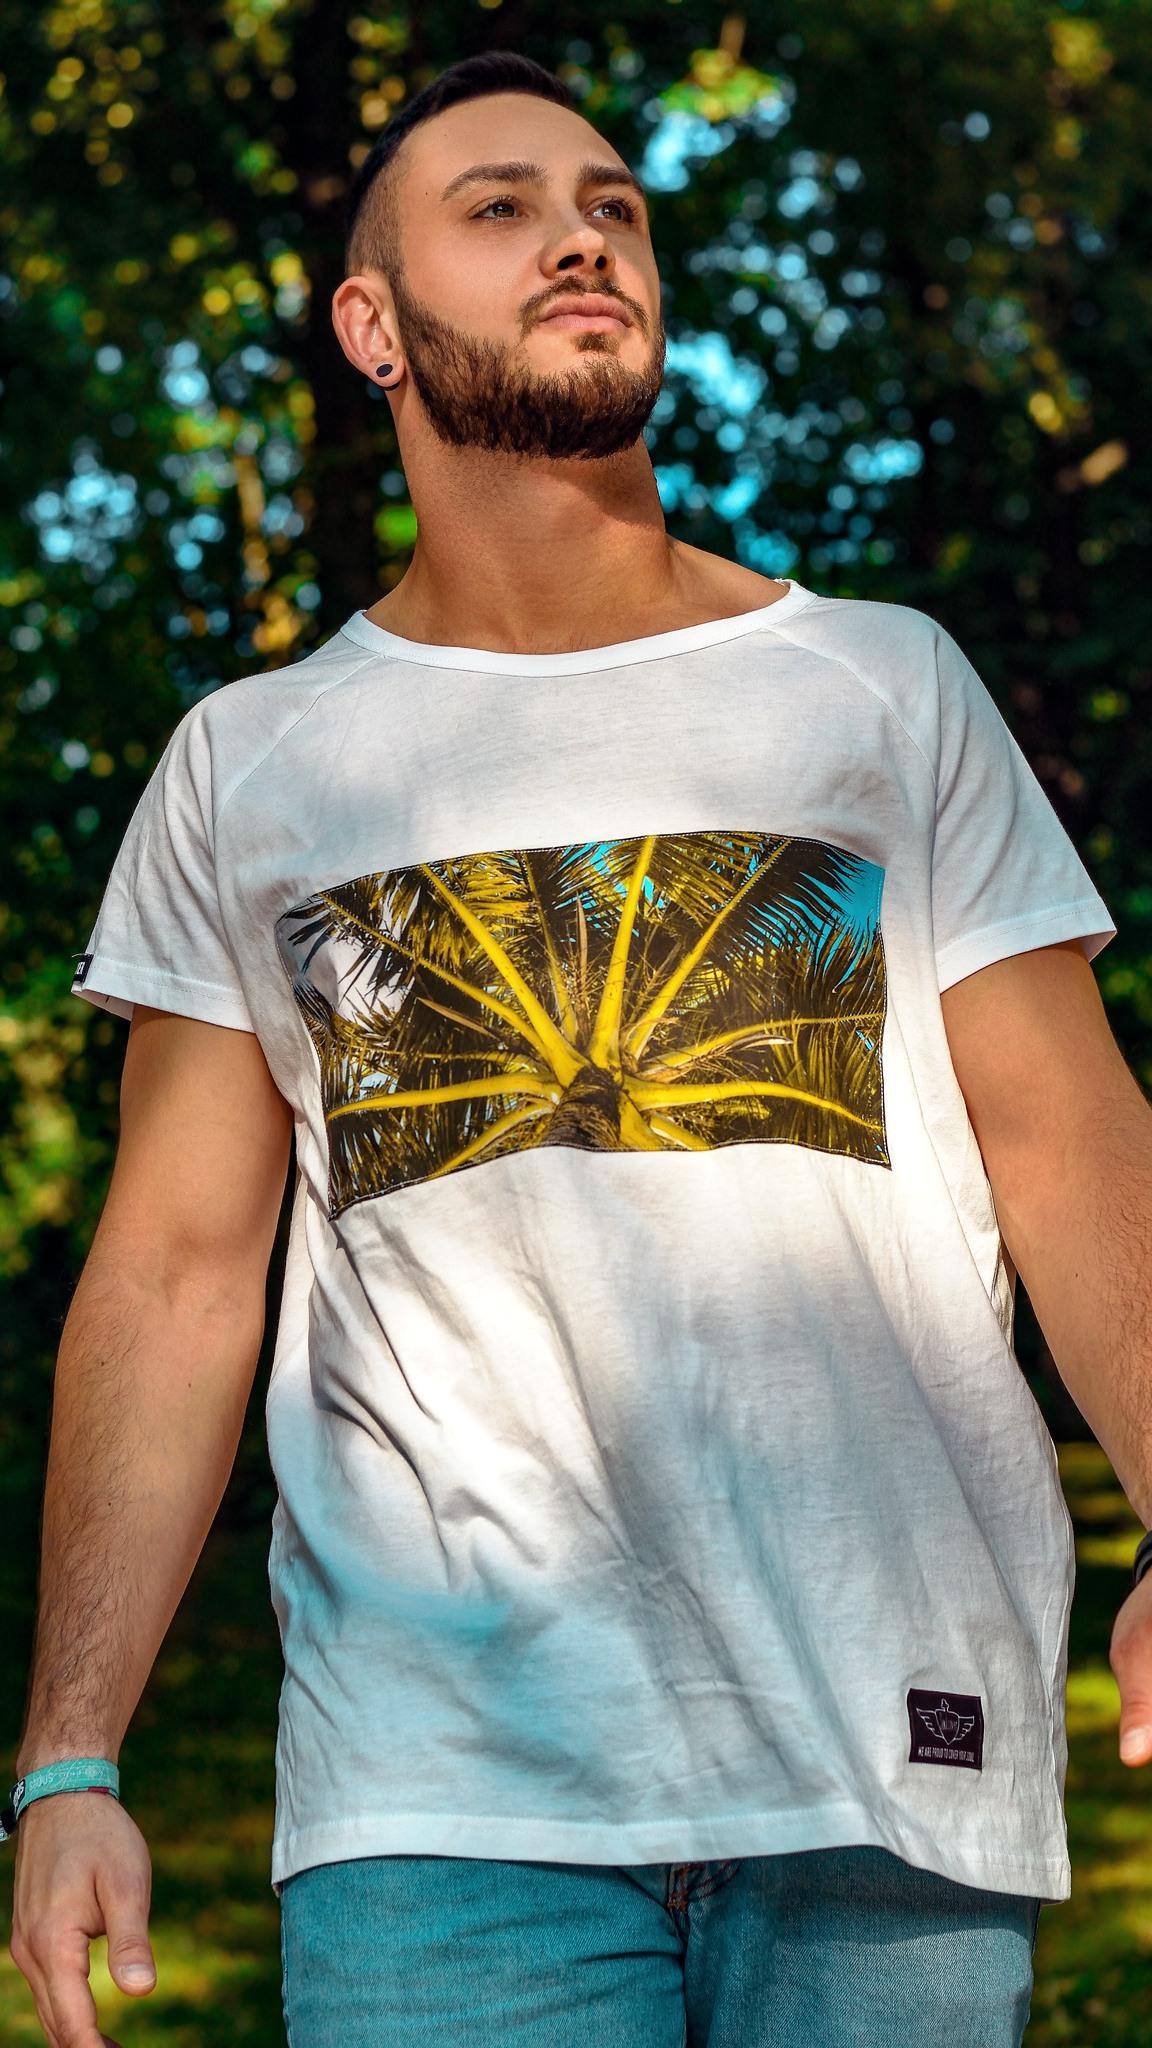 Belize, It, T-Shirt, Palmen, Motiv hochwertiger Colourprint top verarbeitet